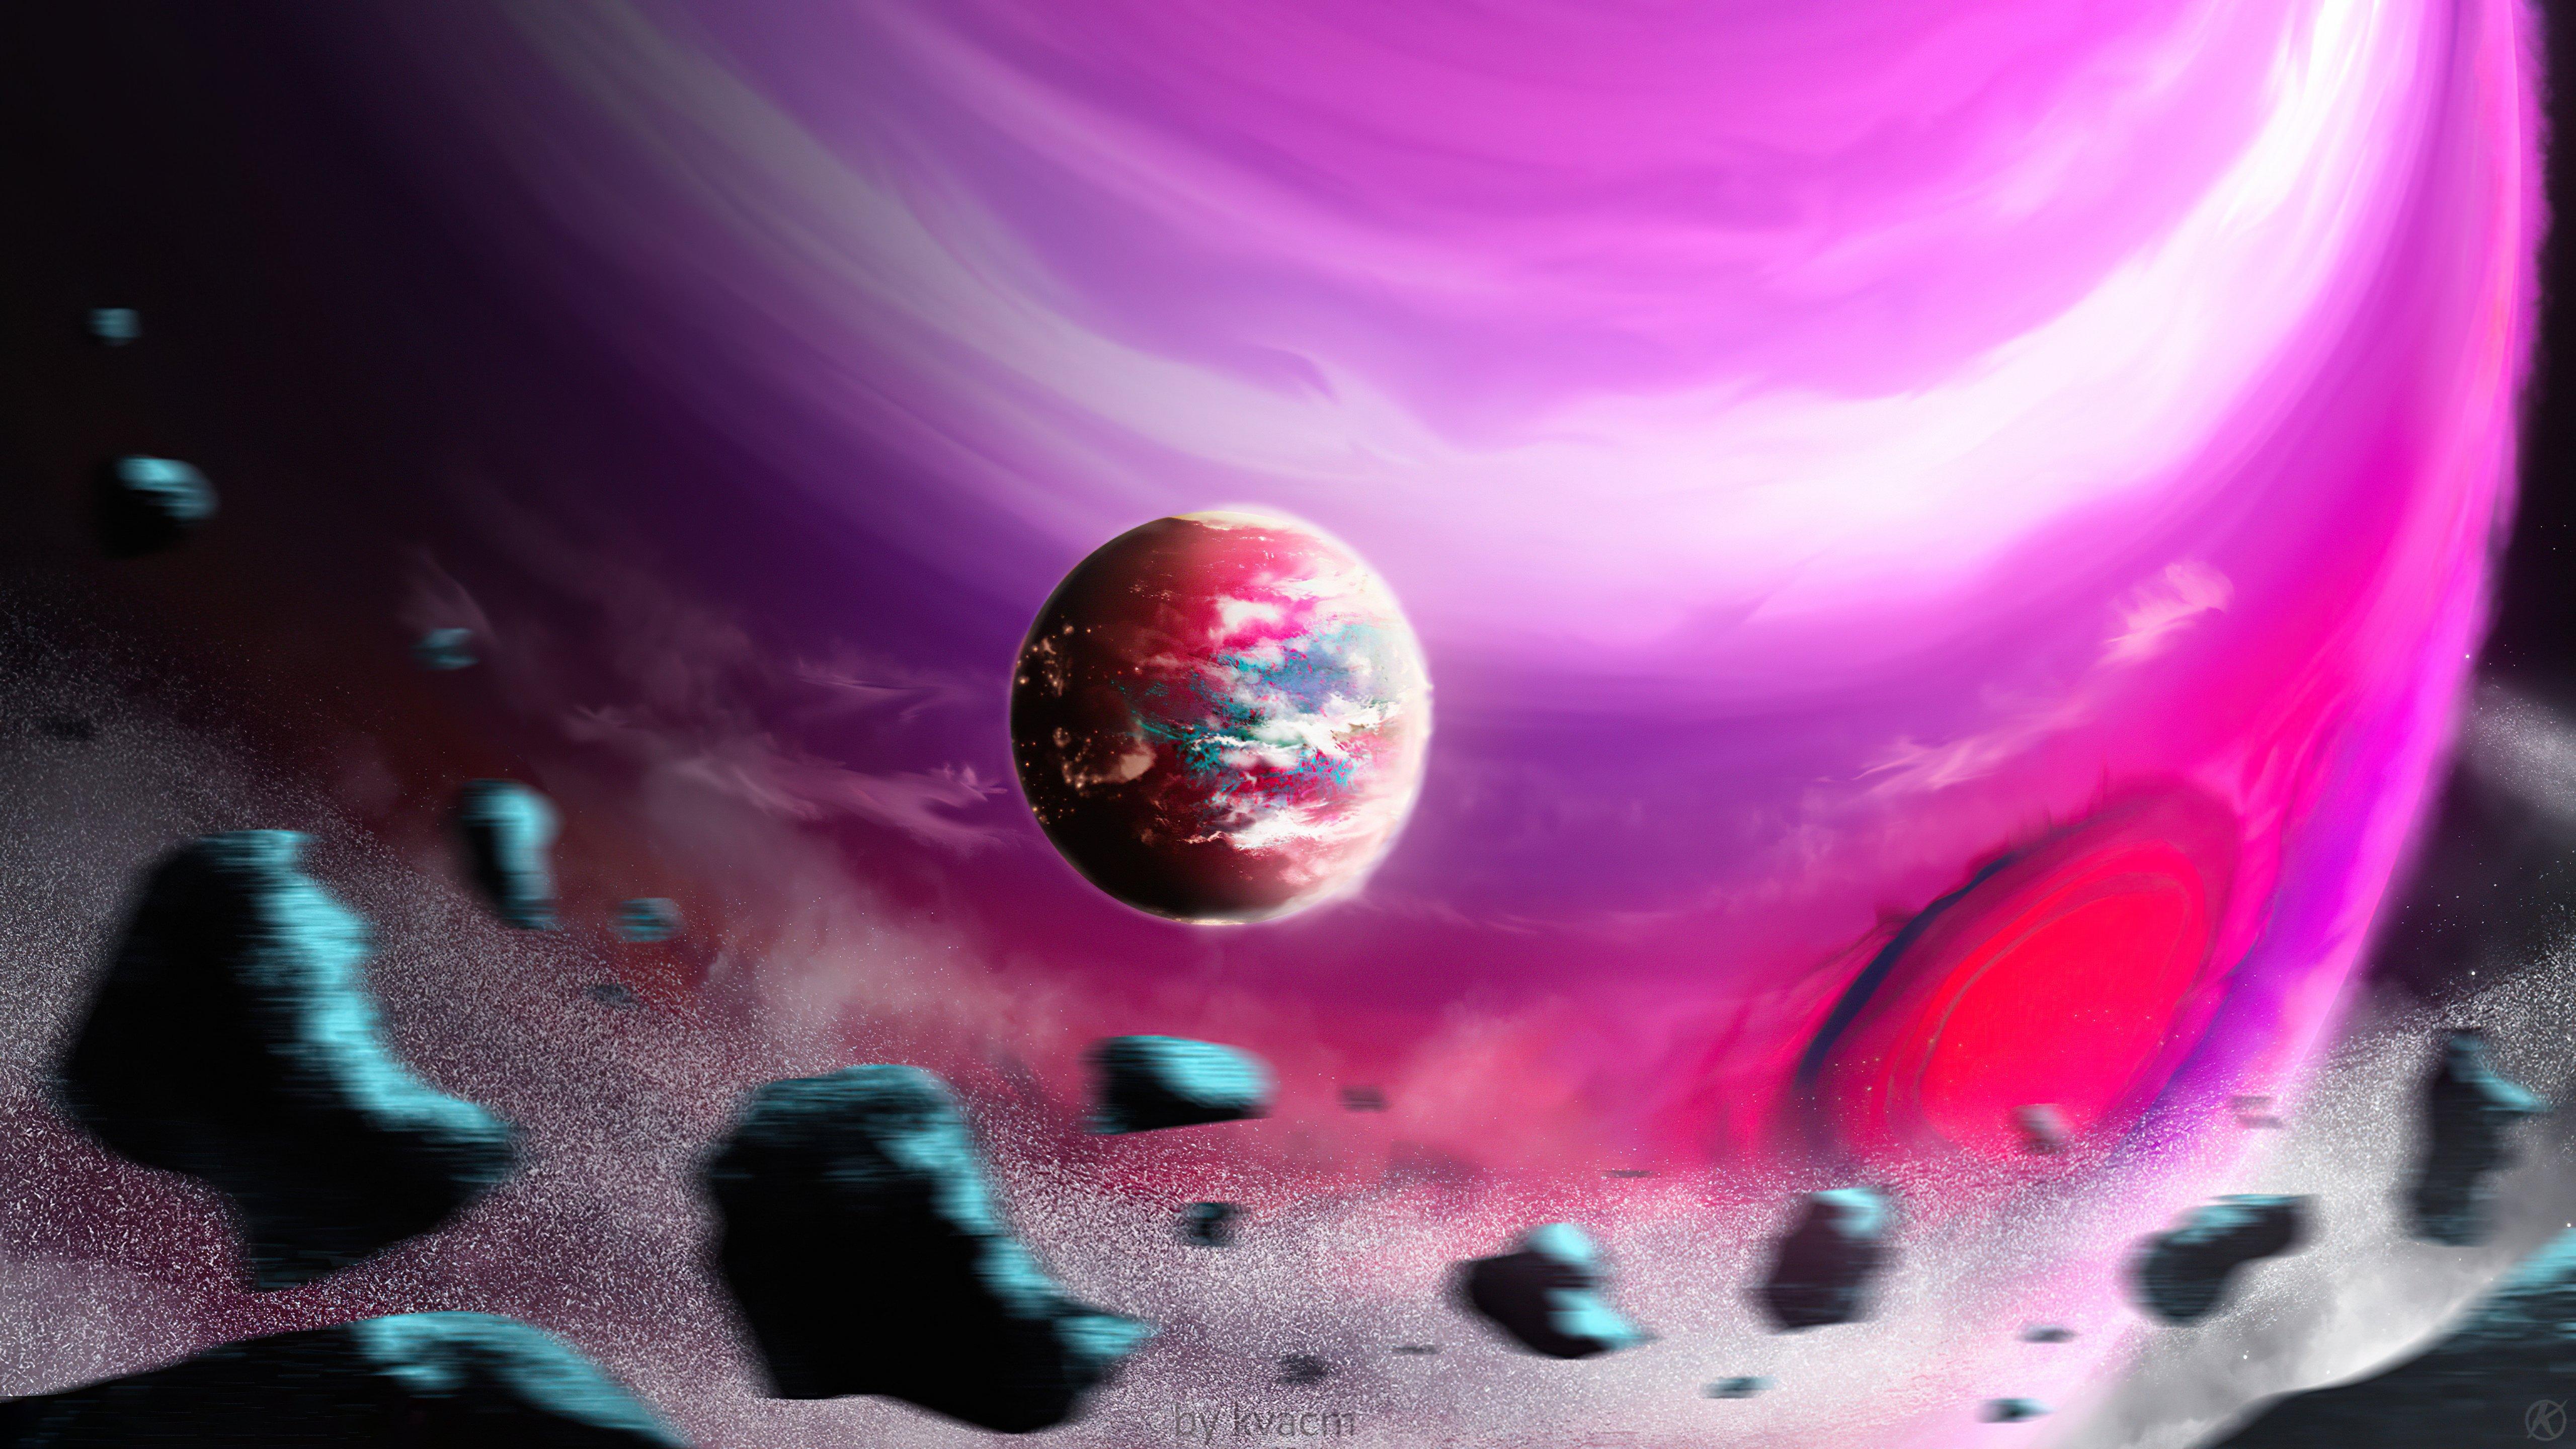 Fondos de pantalla Planeta rosa